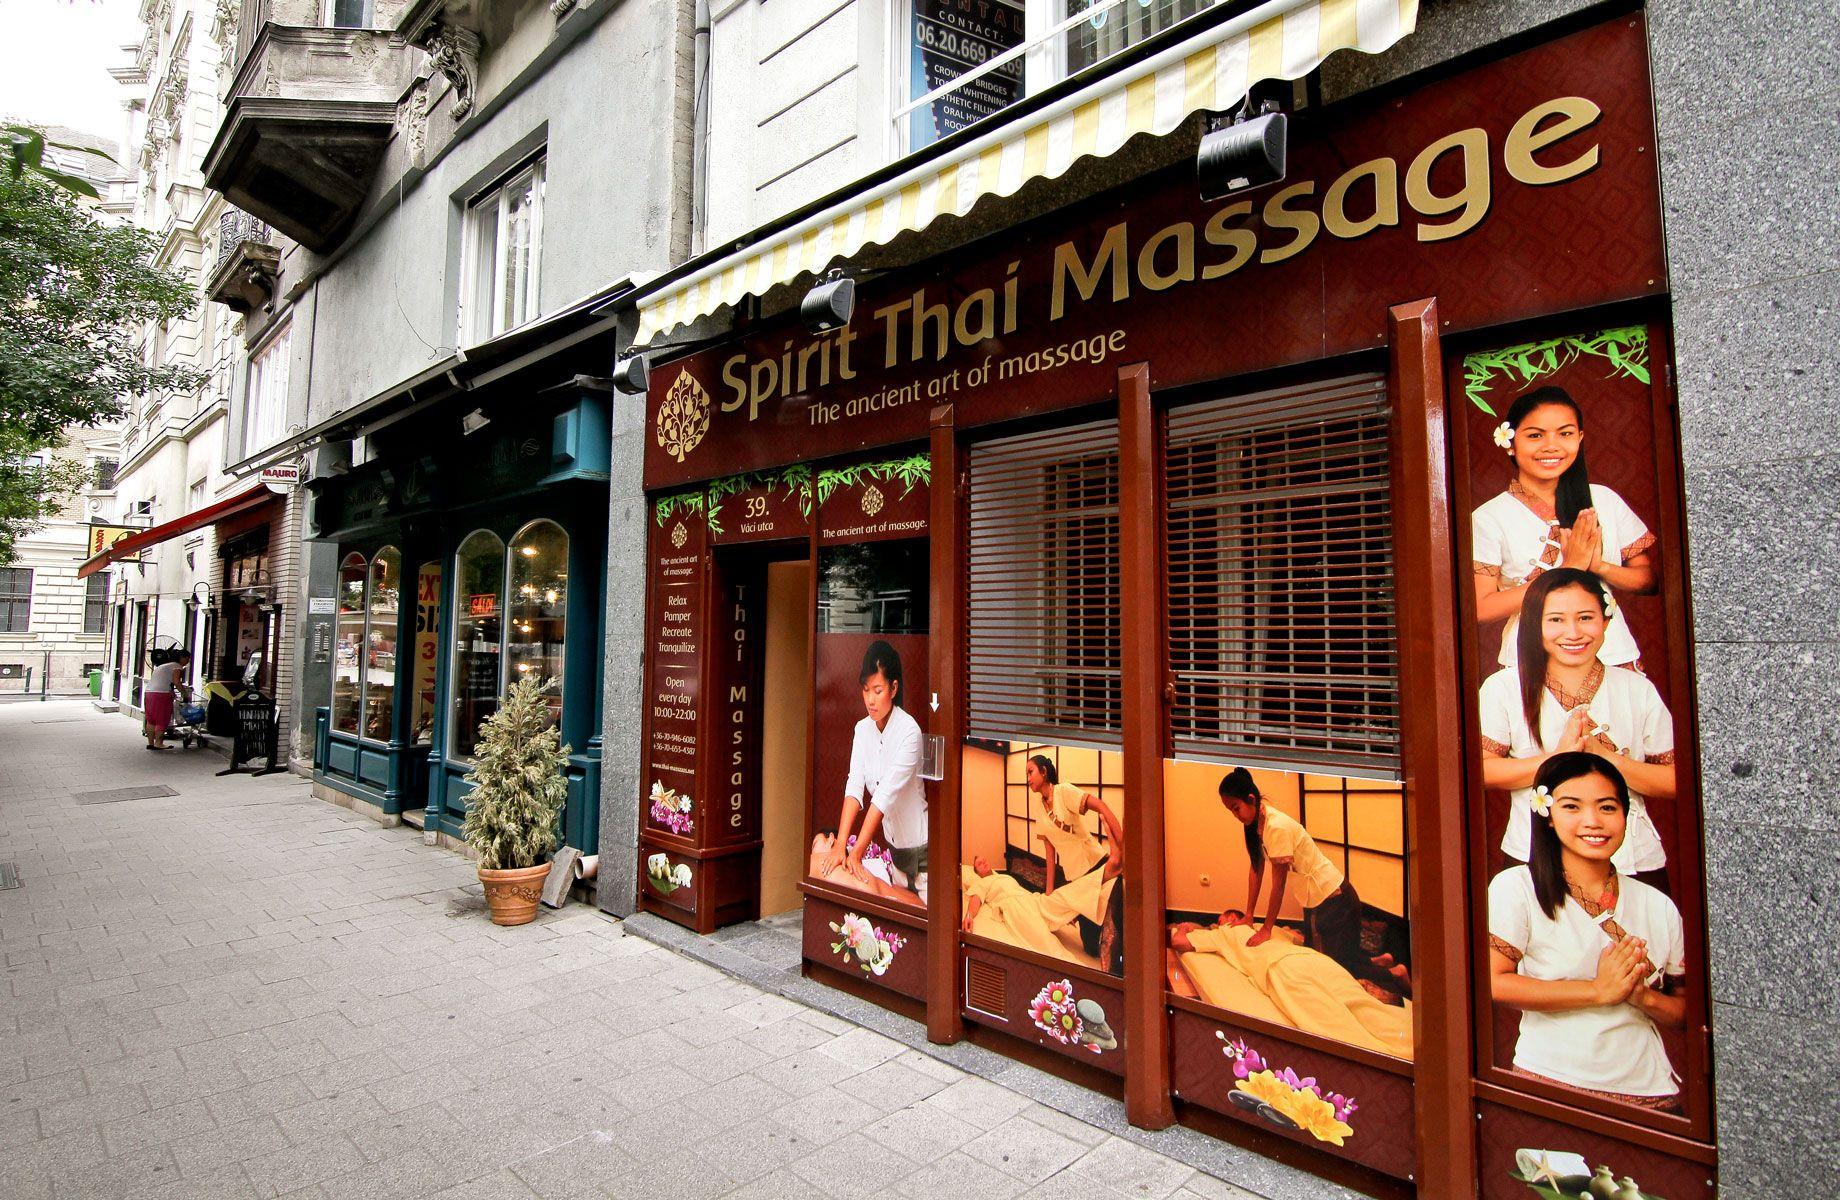 thaimassage he ny thaimassage göteborg